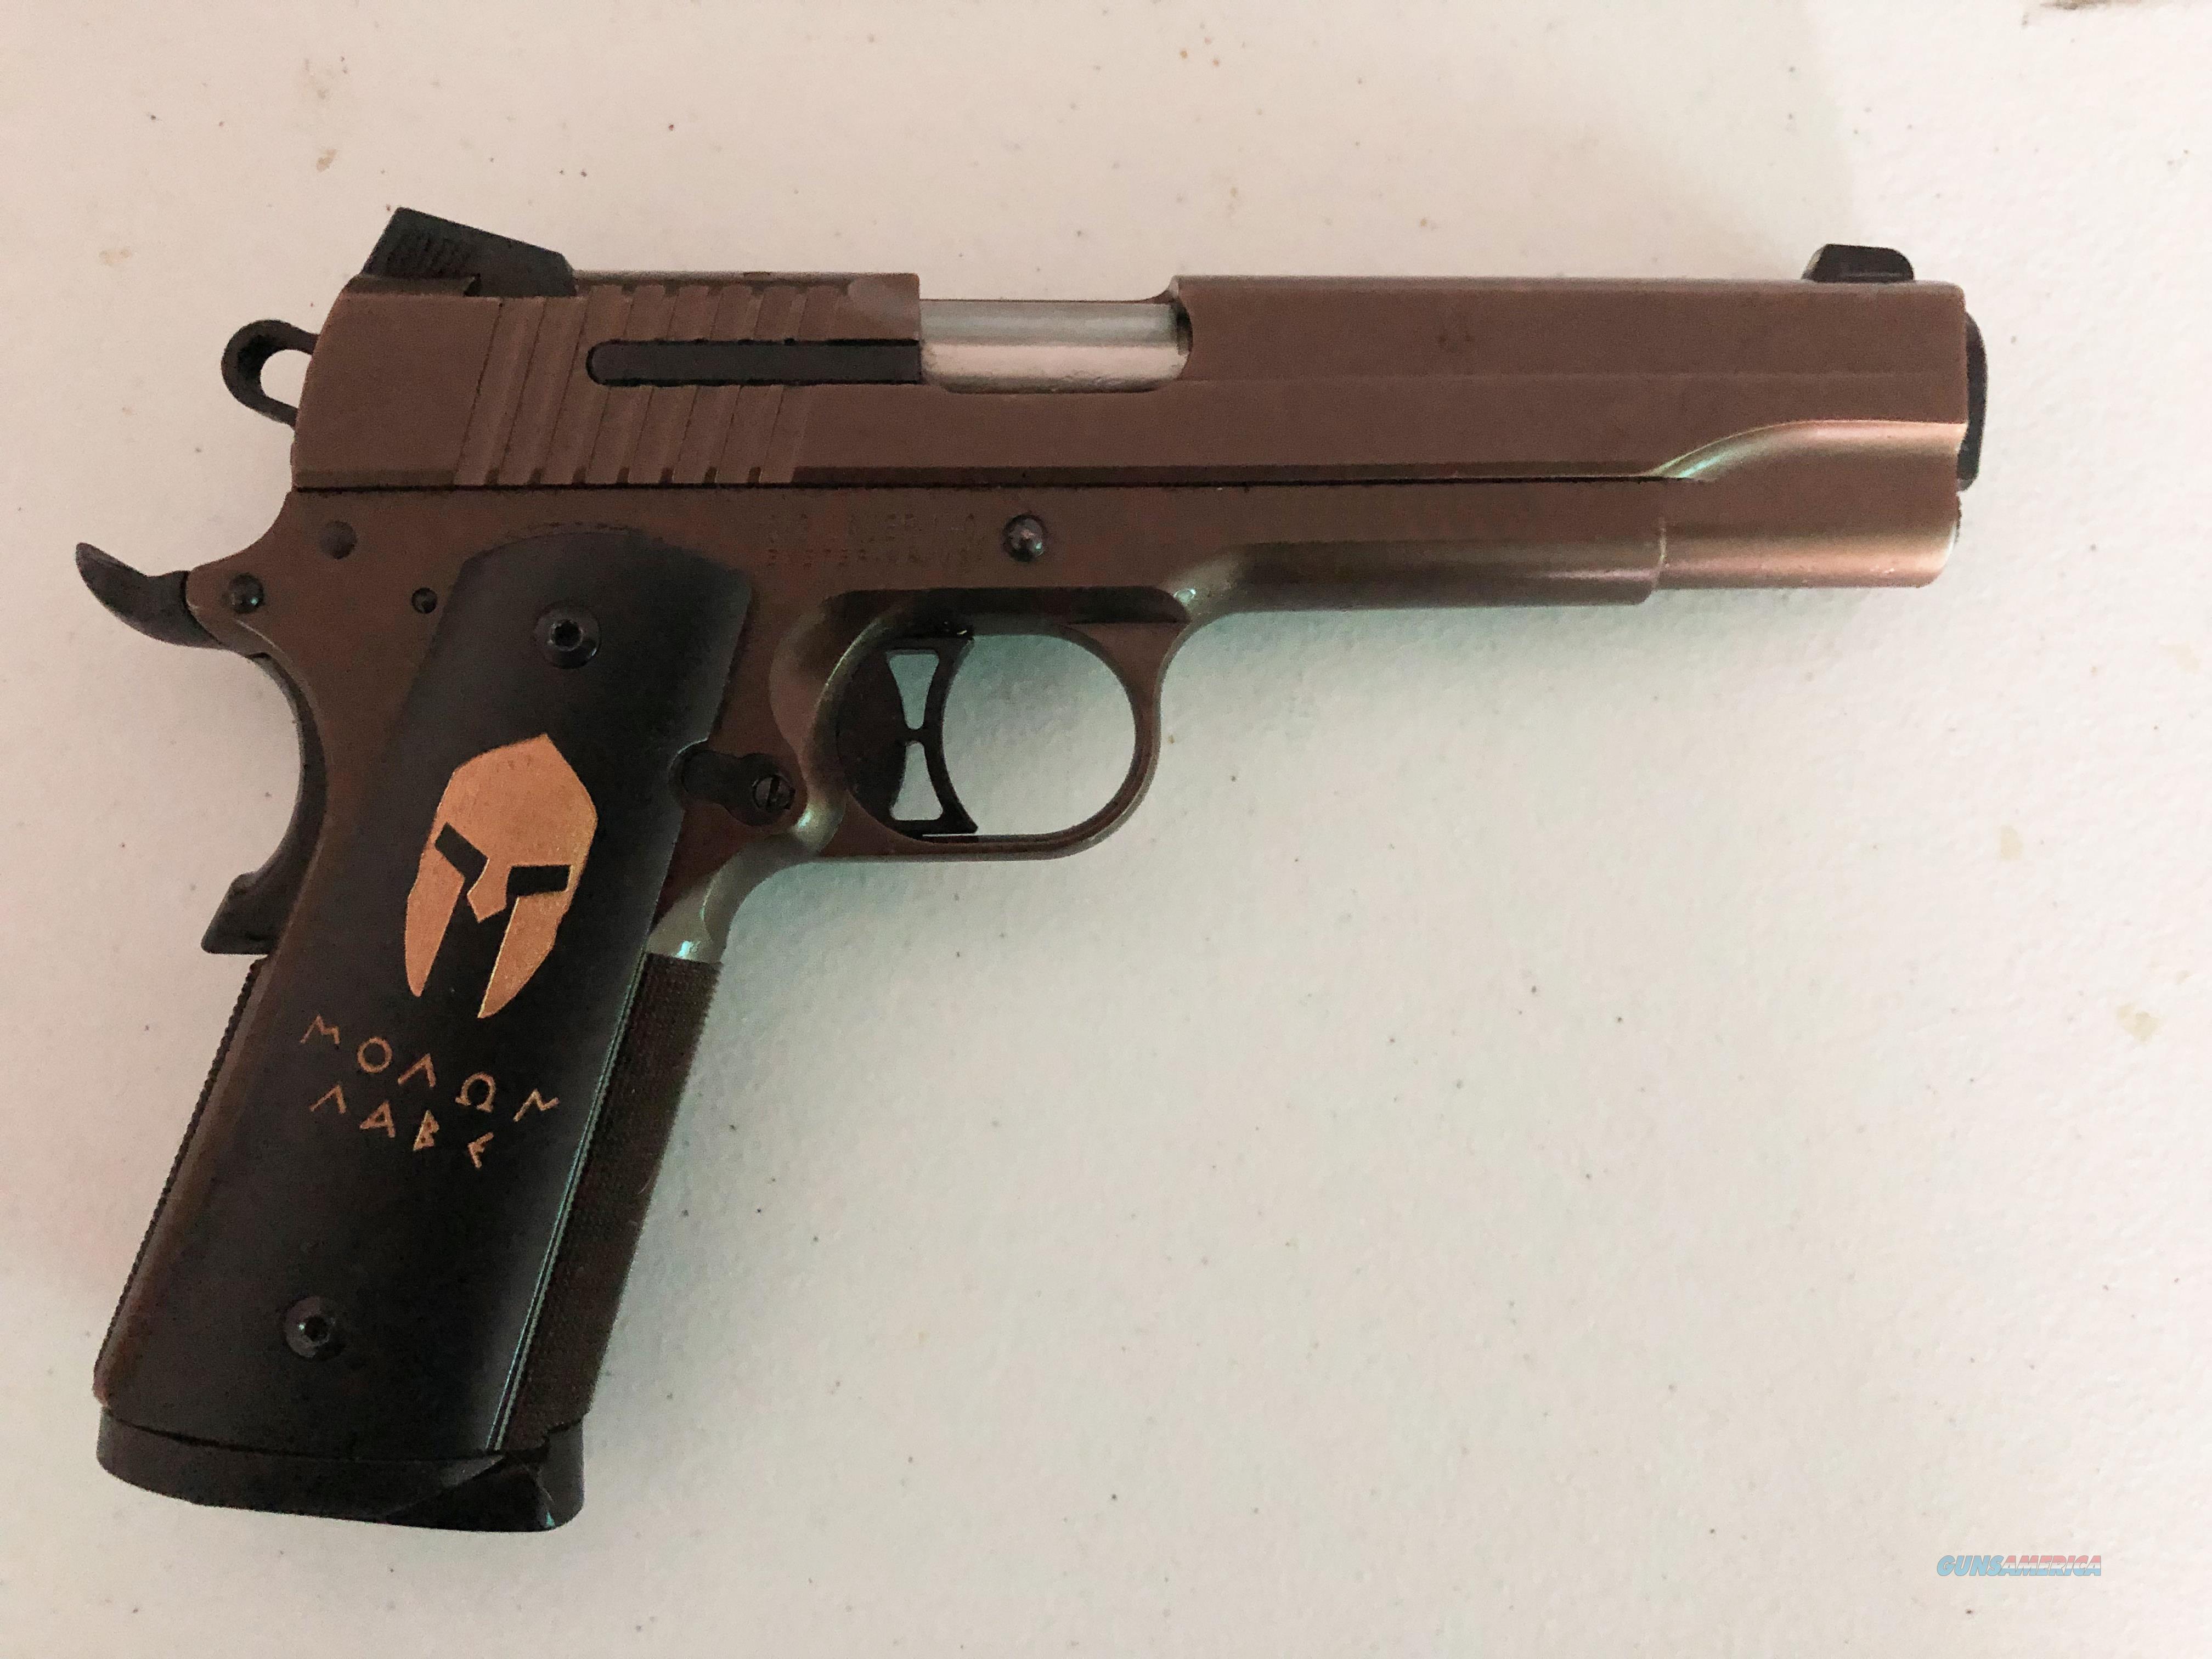 SIG SAUER Spartan  Guns > Pistols > 1911 Pistol Copies (non-Colt)